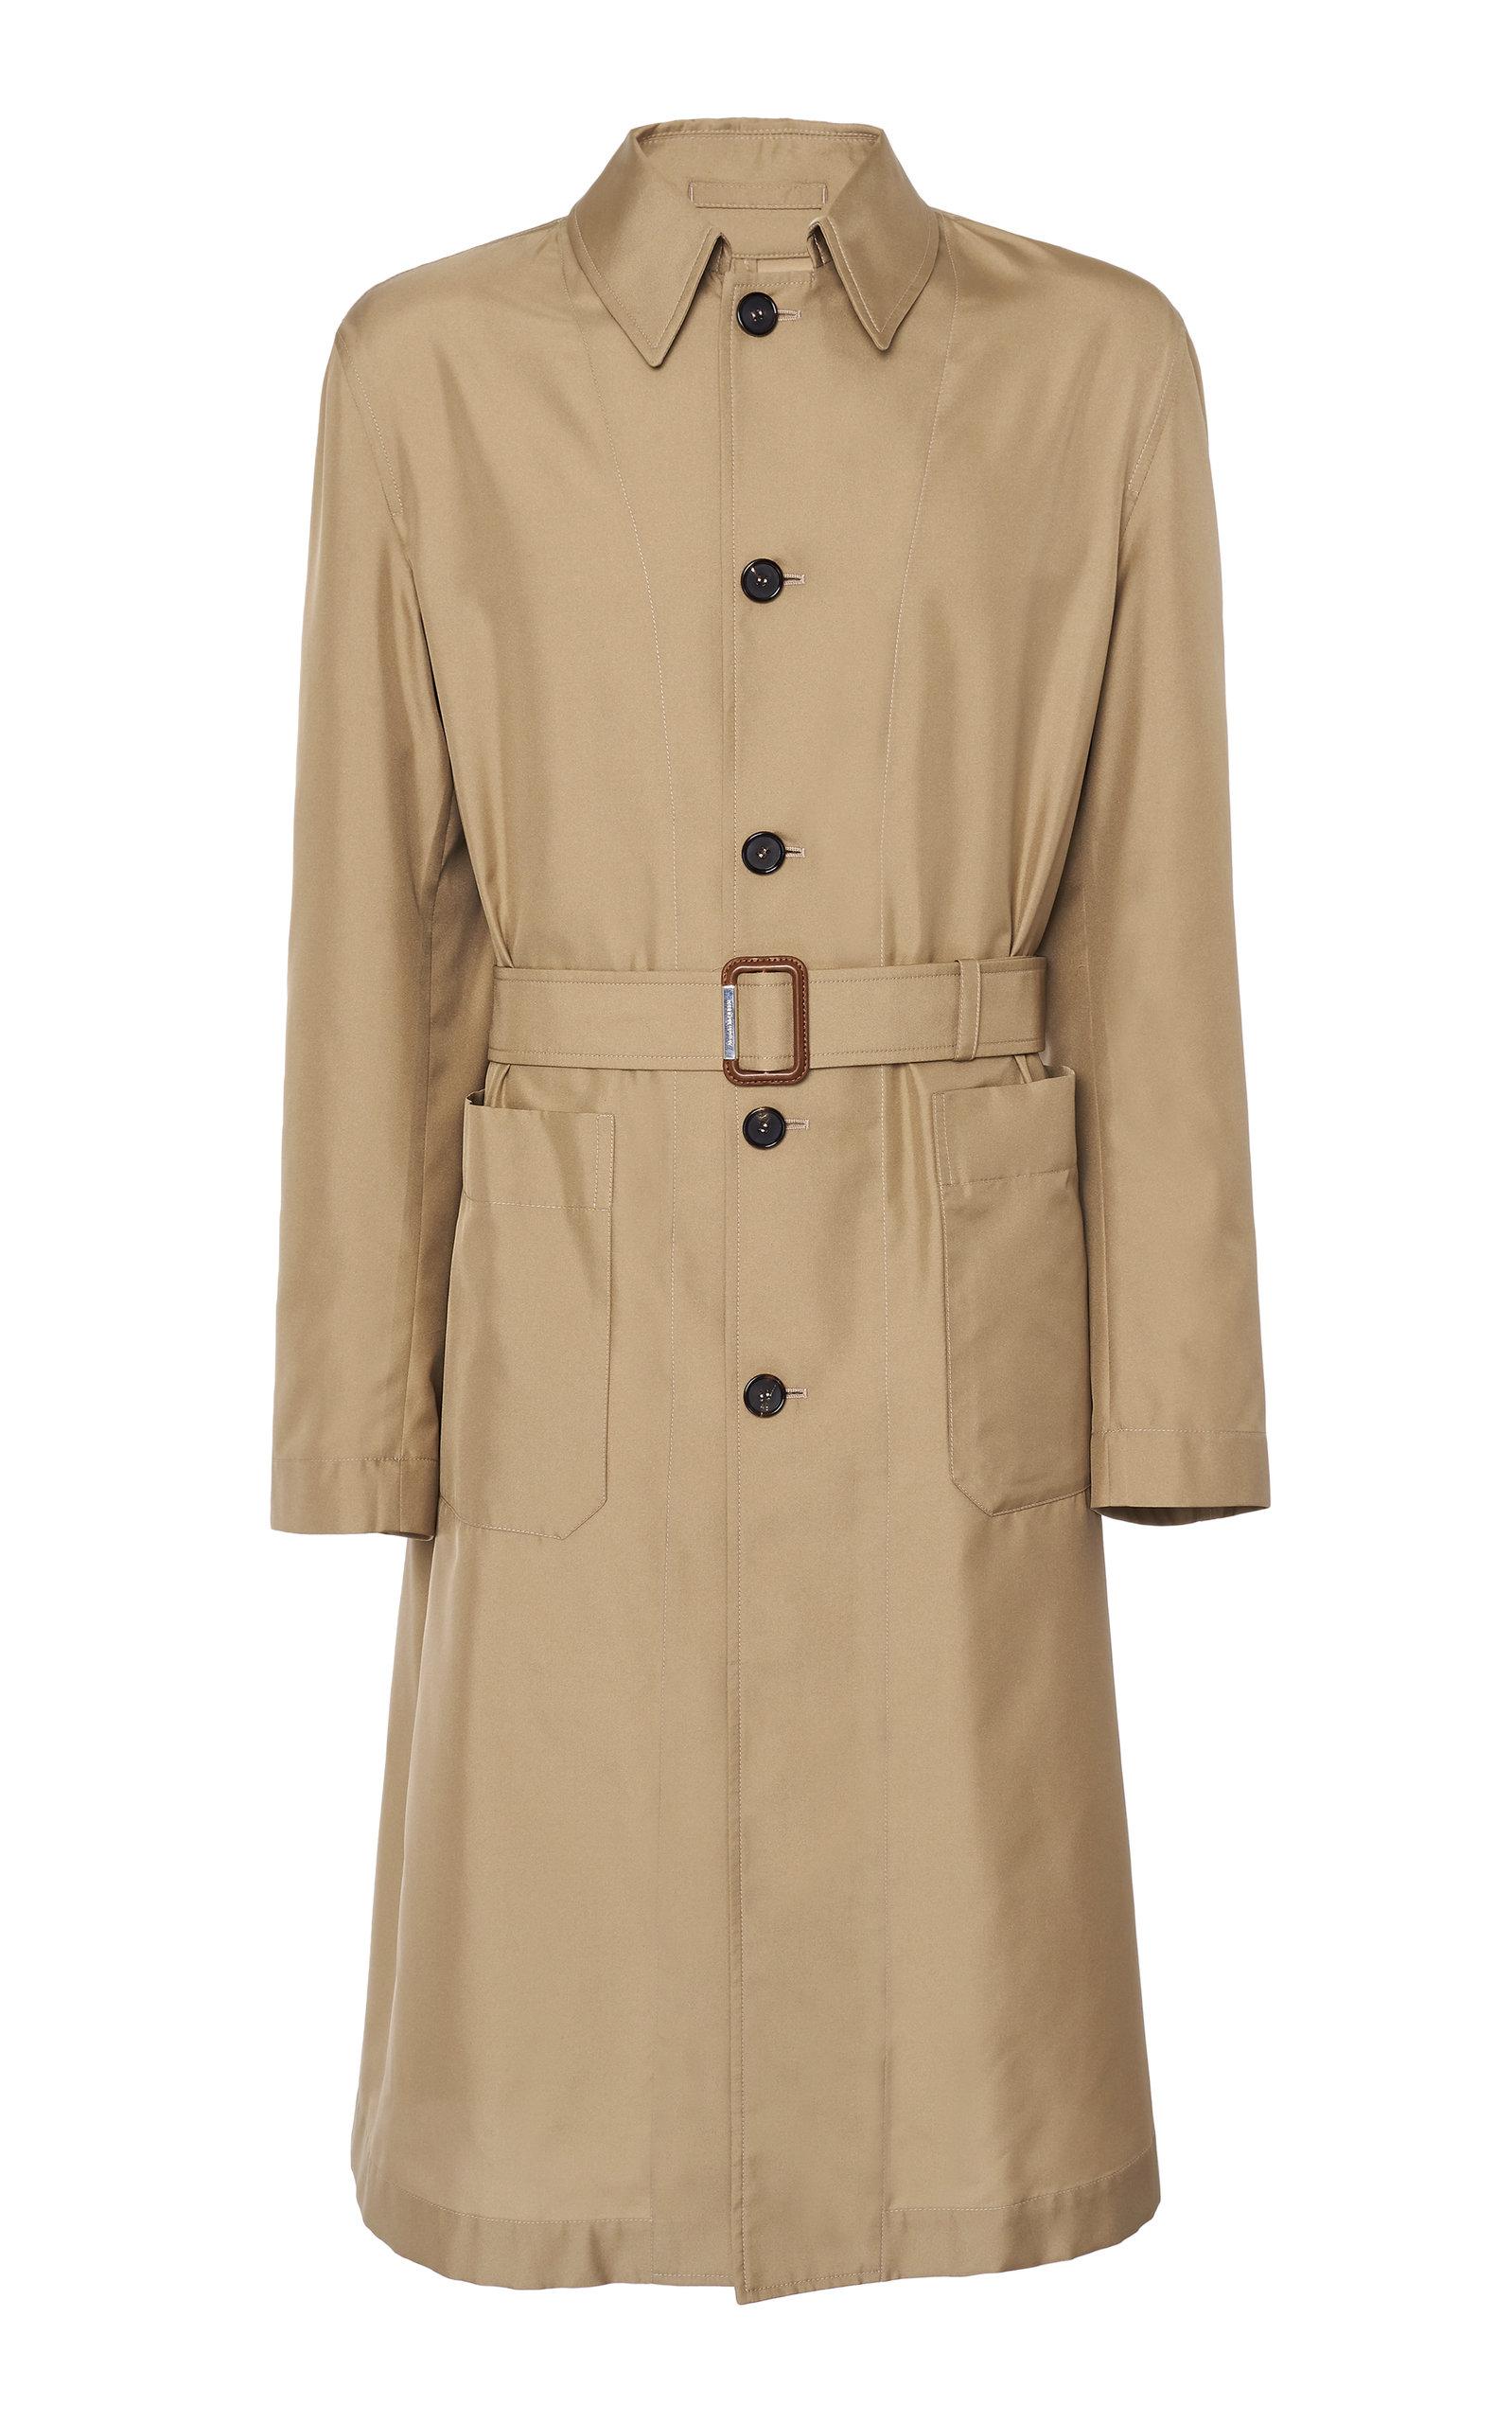 Nylon Womens Trench Coats You'll Love | DailyMail